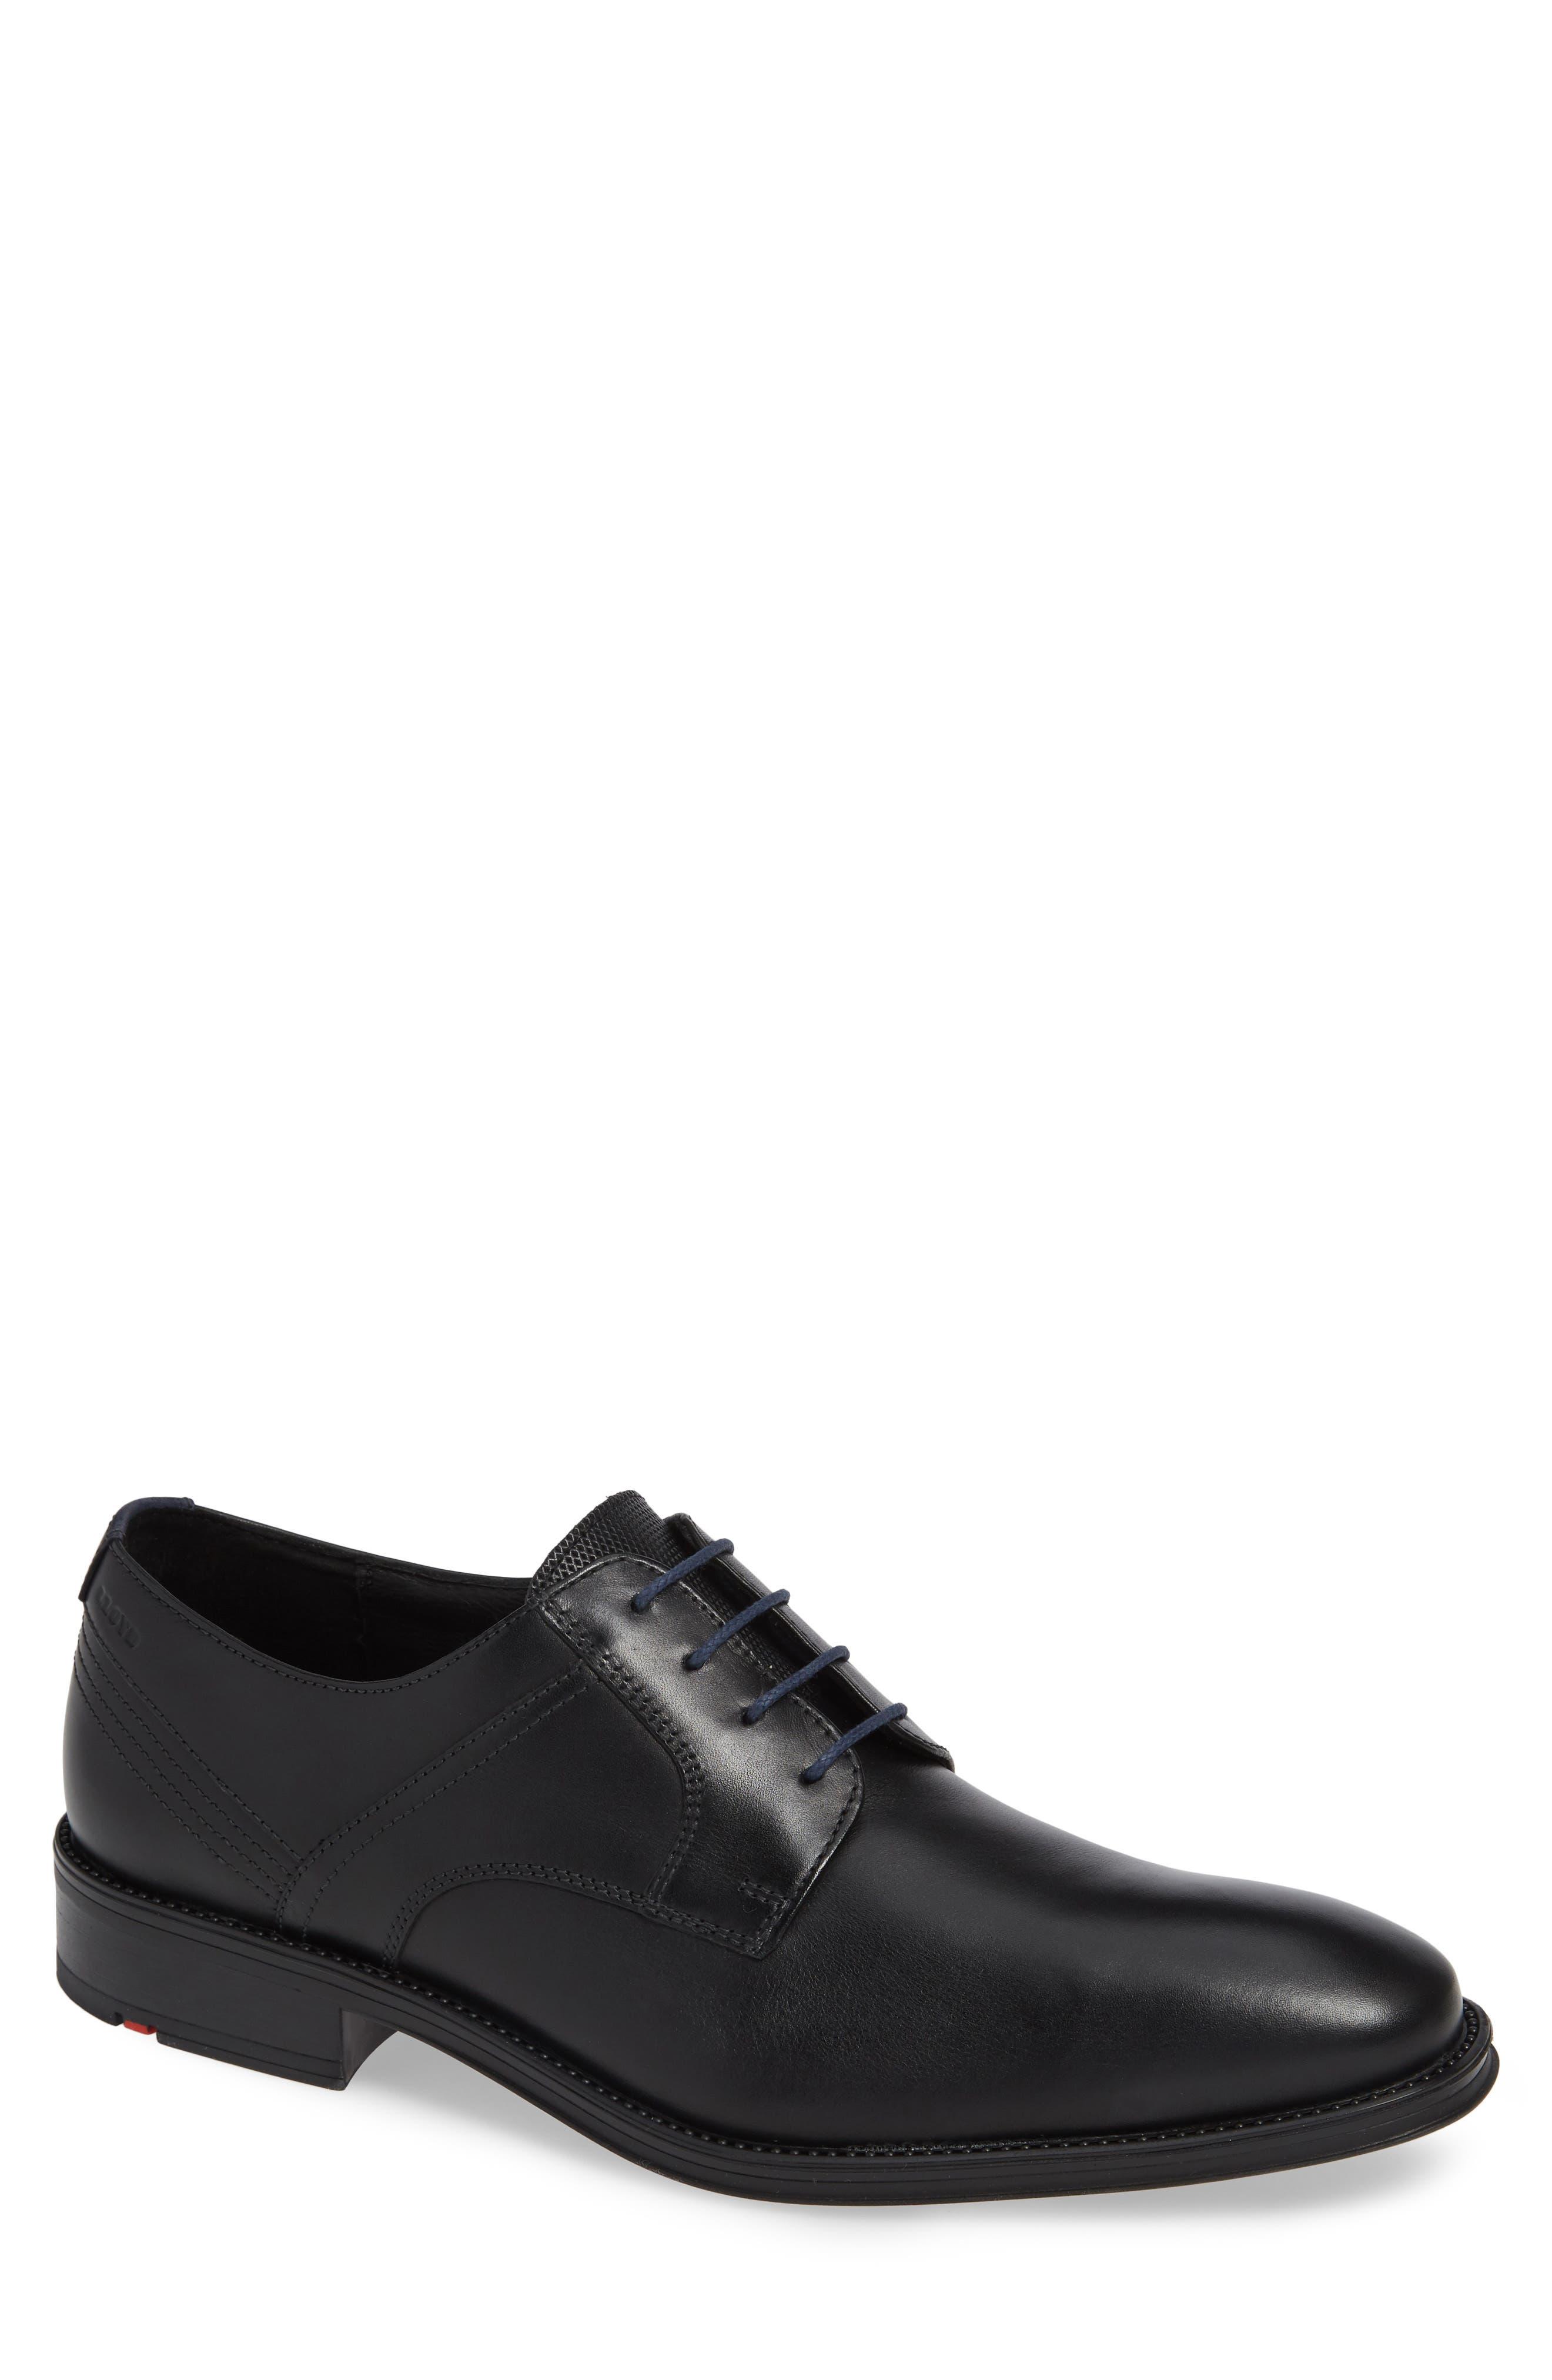 Gala Plain Toe Derby,                         Main,                         color, BLACK/ MIDNIGHT LEATHER